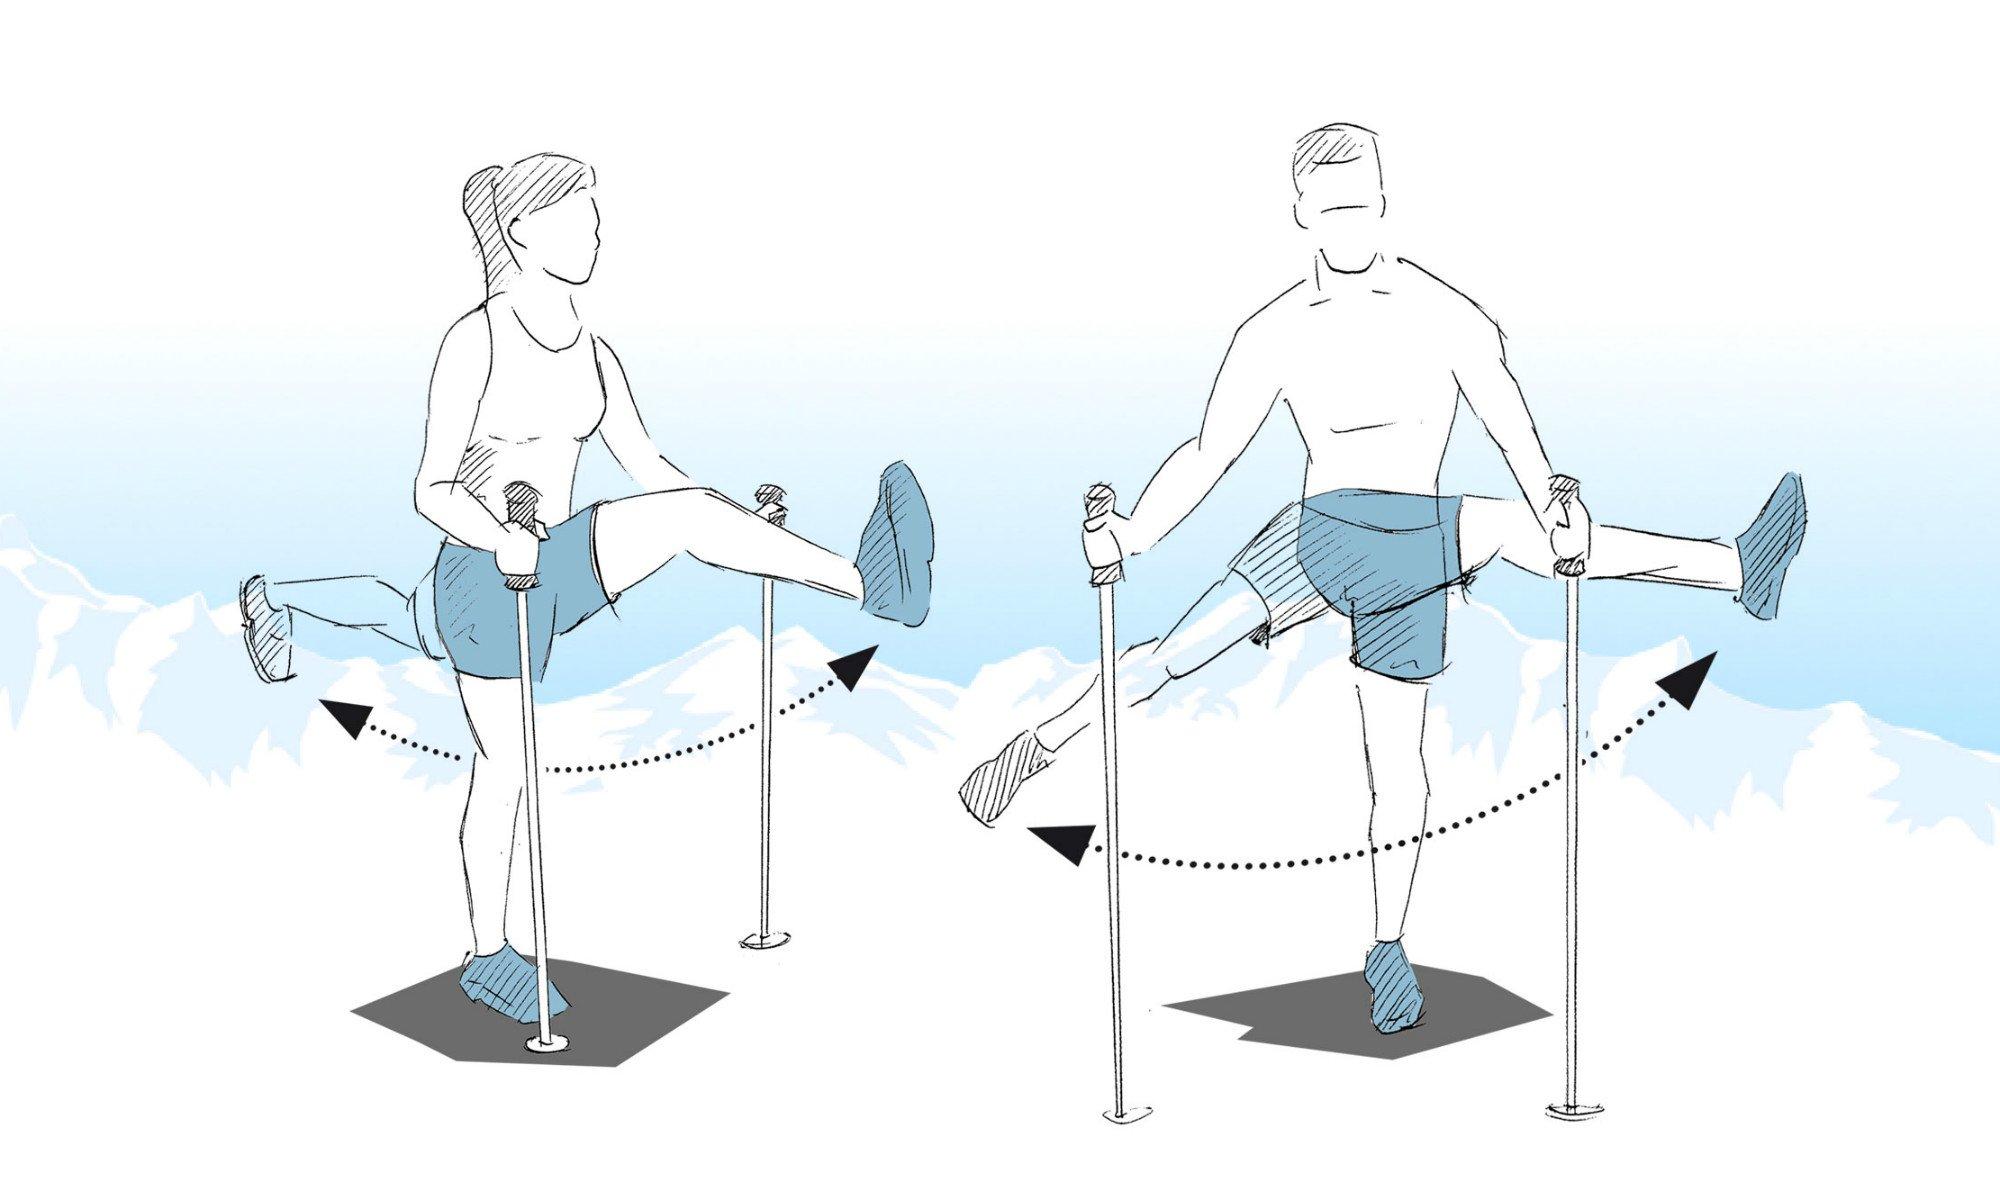 Démonstration du balancement des jambes.